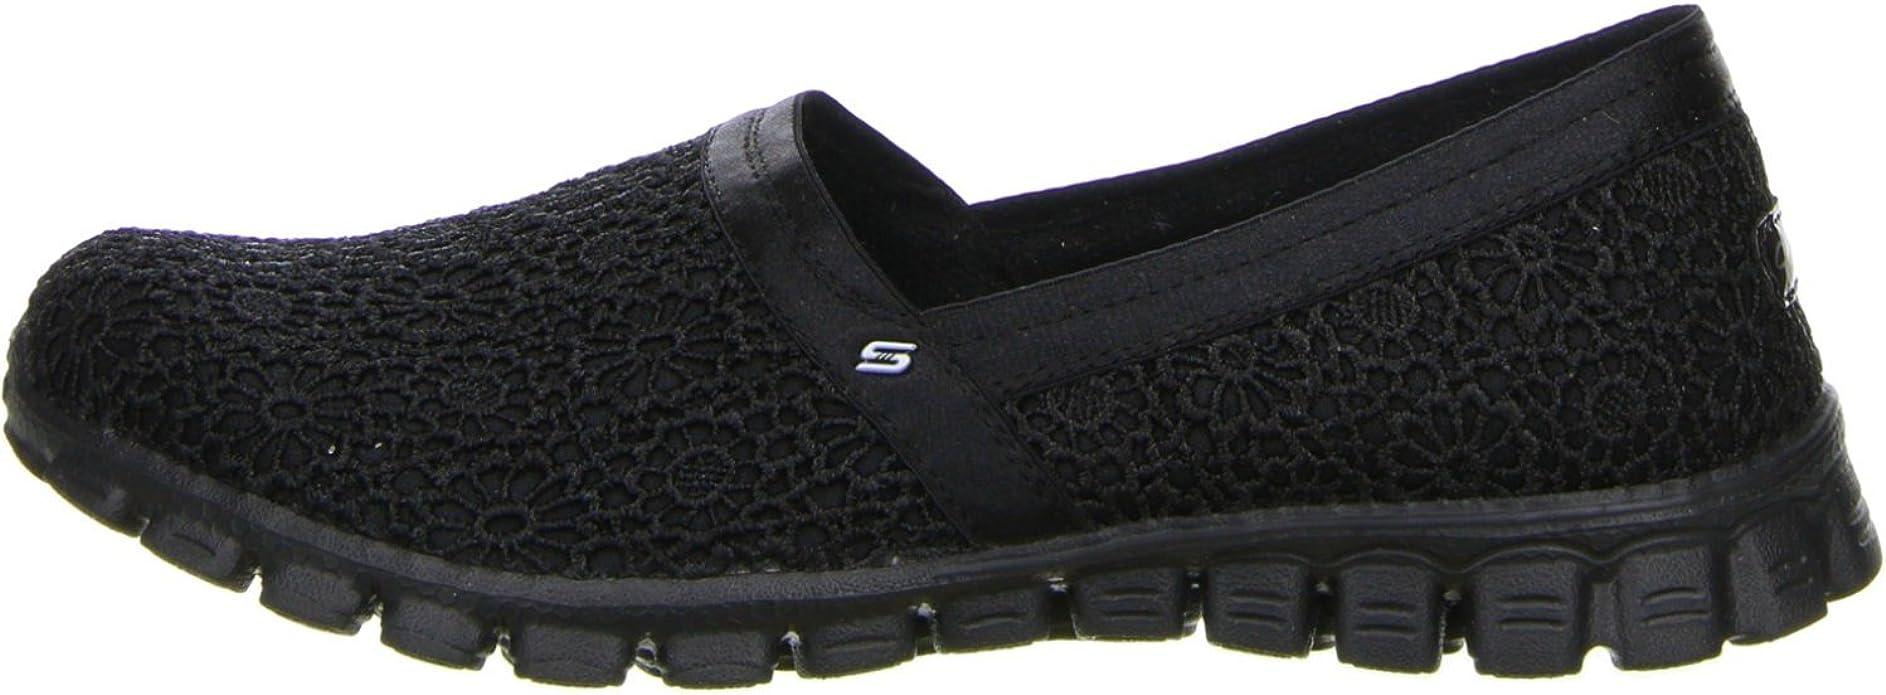 Skechers EZ Flex 2 Make Believe Black